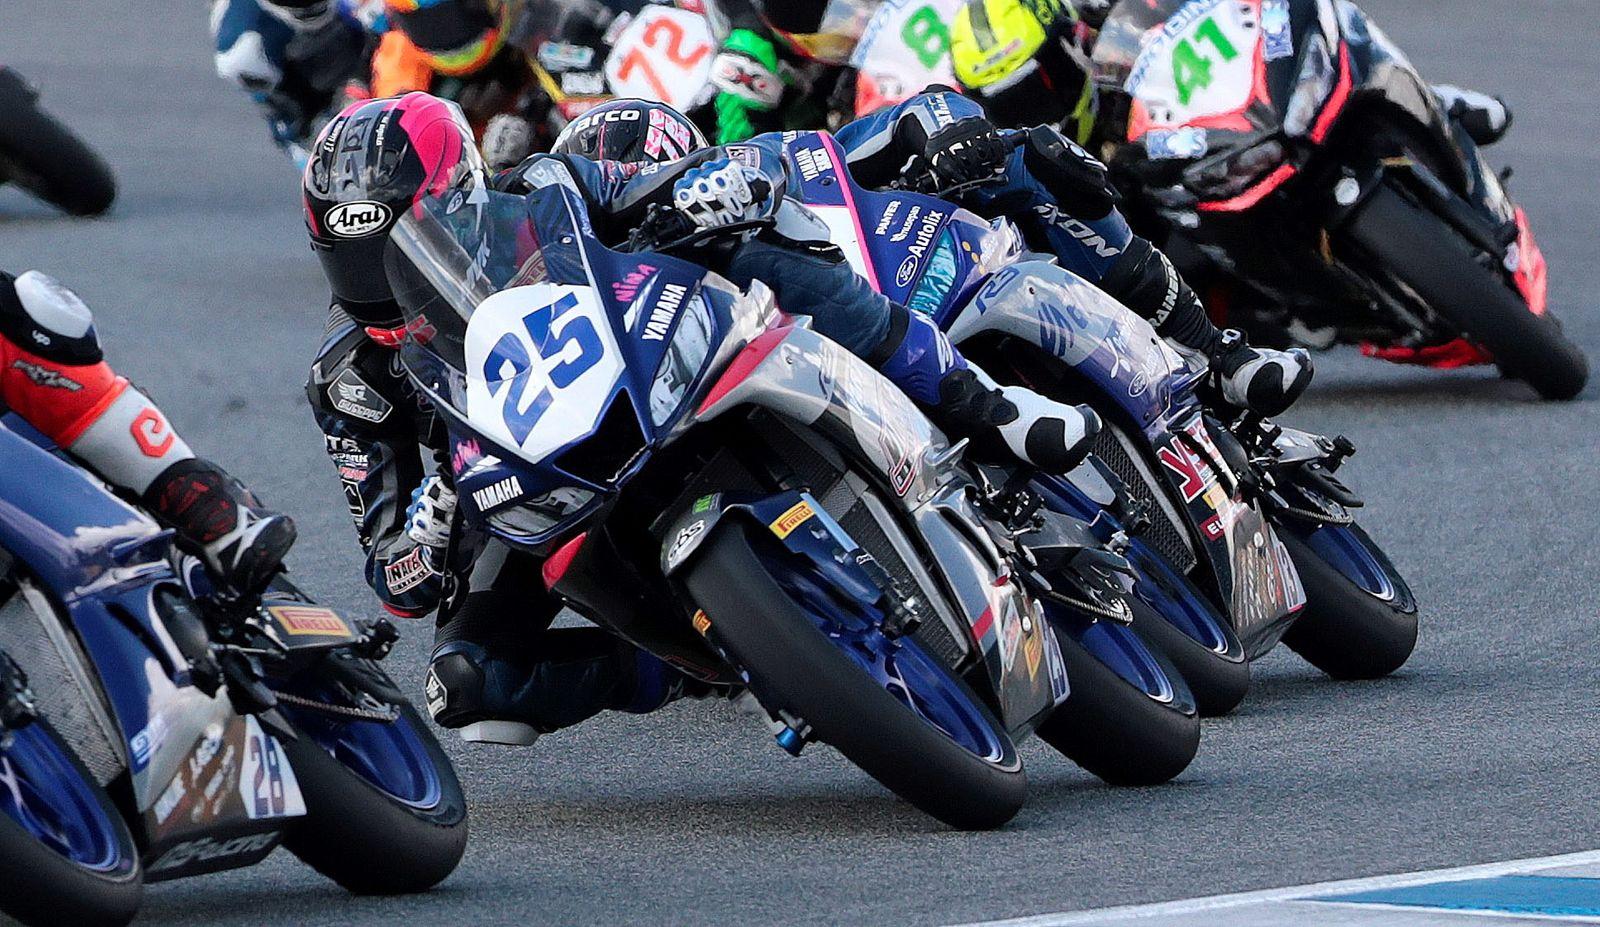 SuperSport300 race